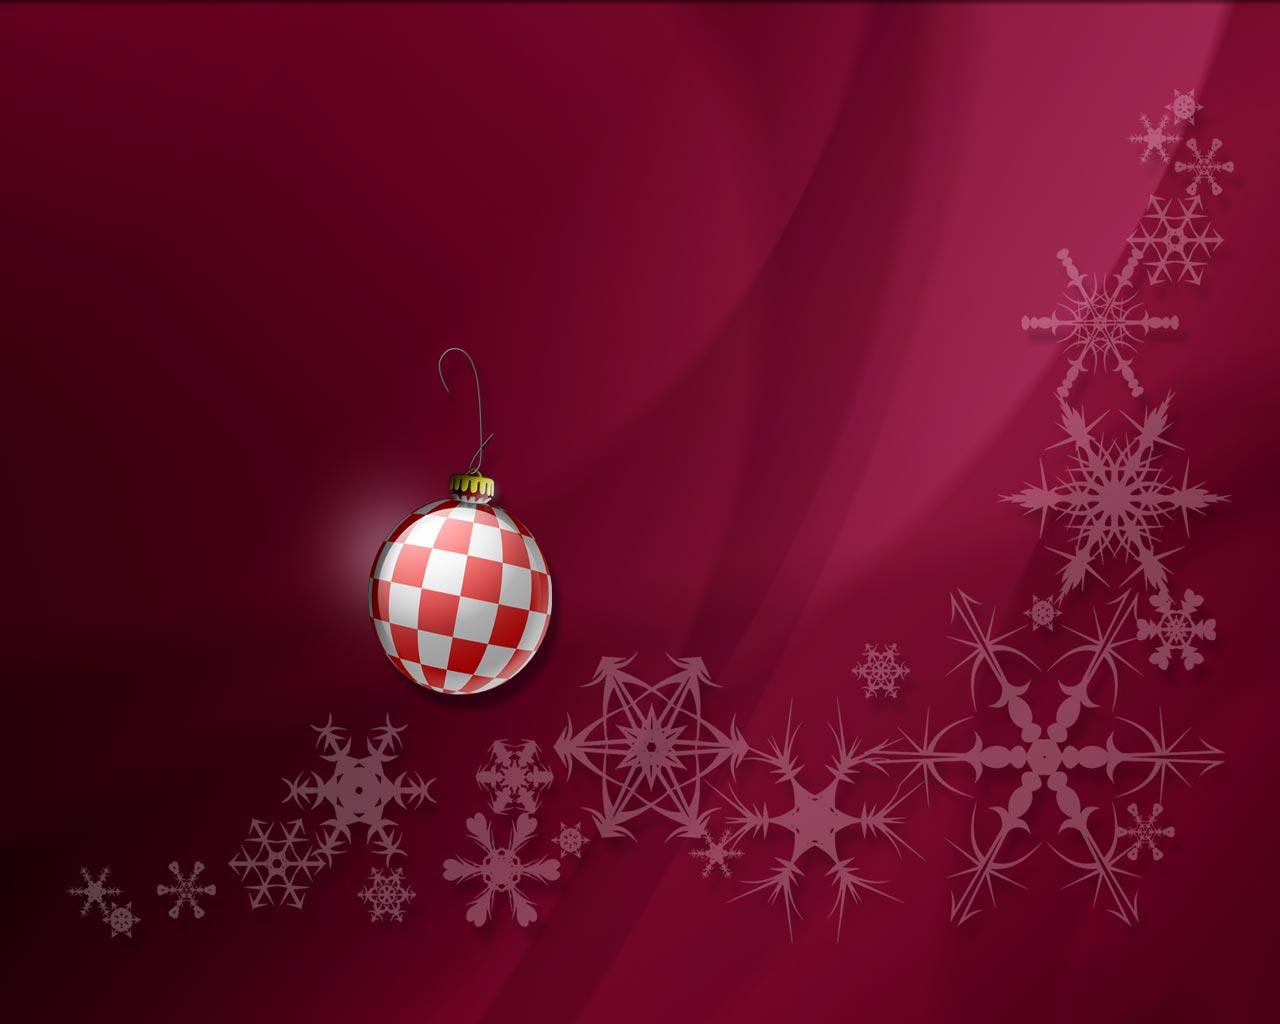 Holiday Desktop Backgrounds 1280x1024